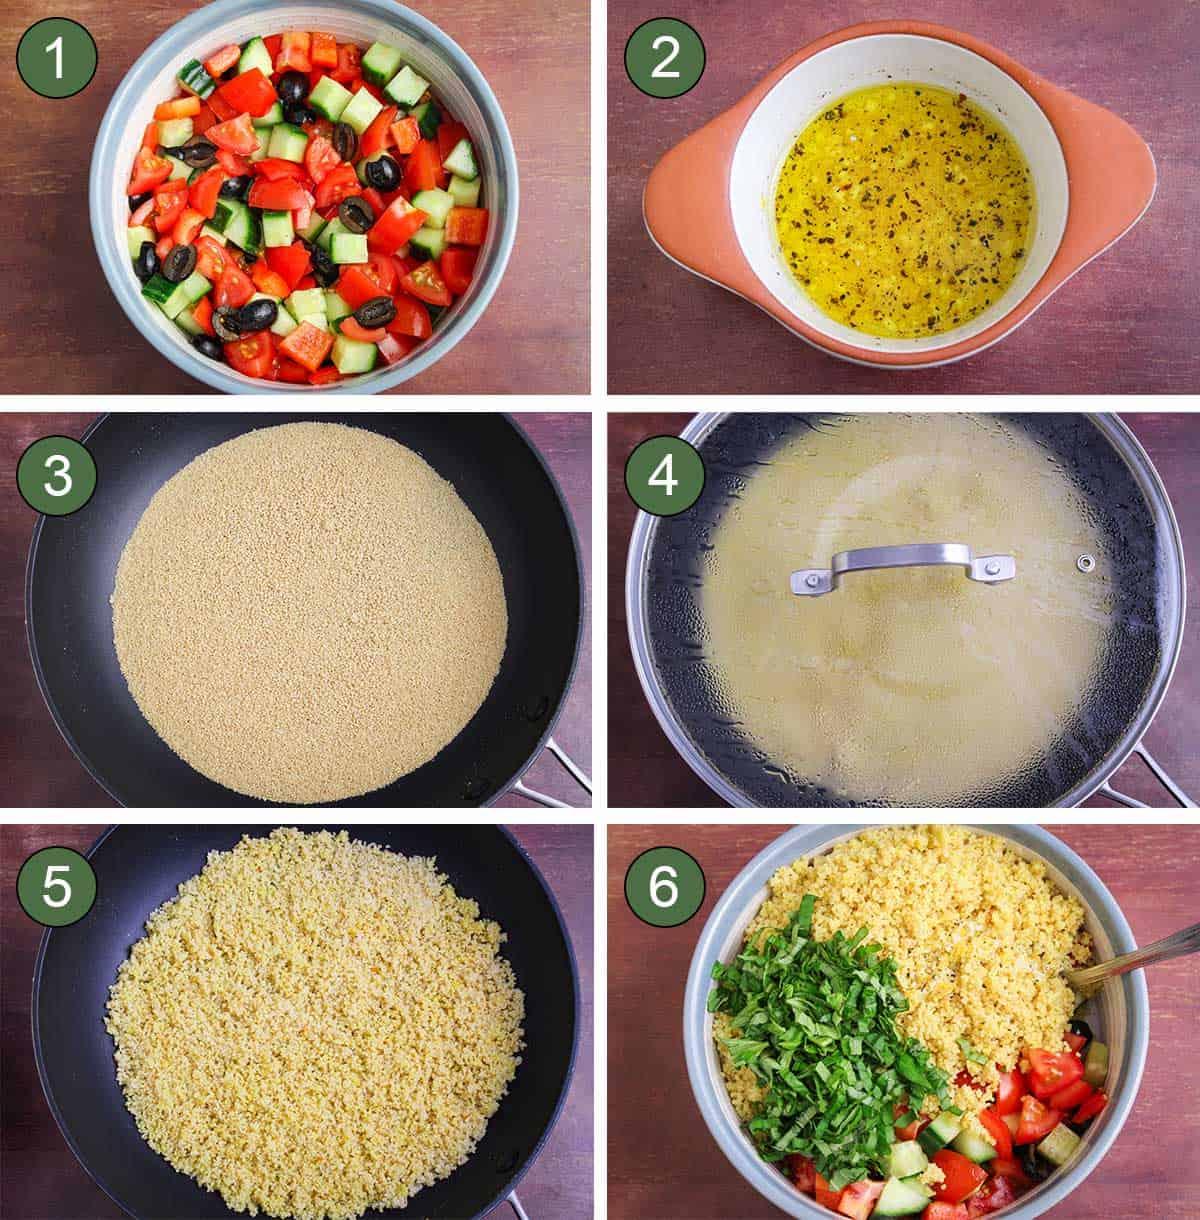 6 Process Shots Showing How to Make Vegan Couscous Salad